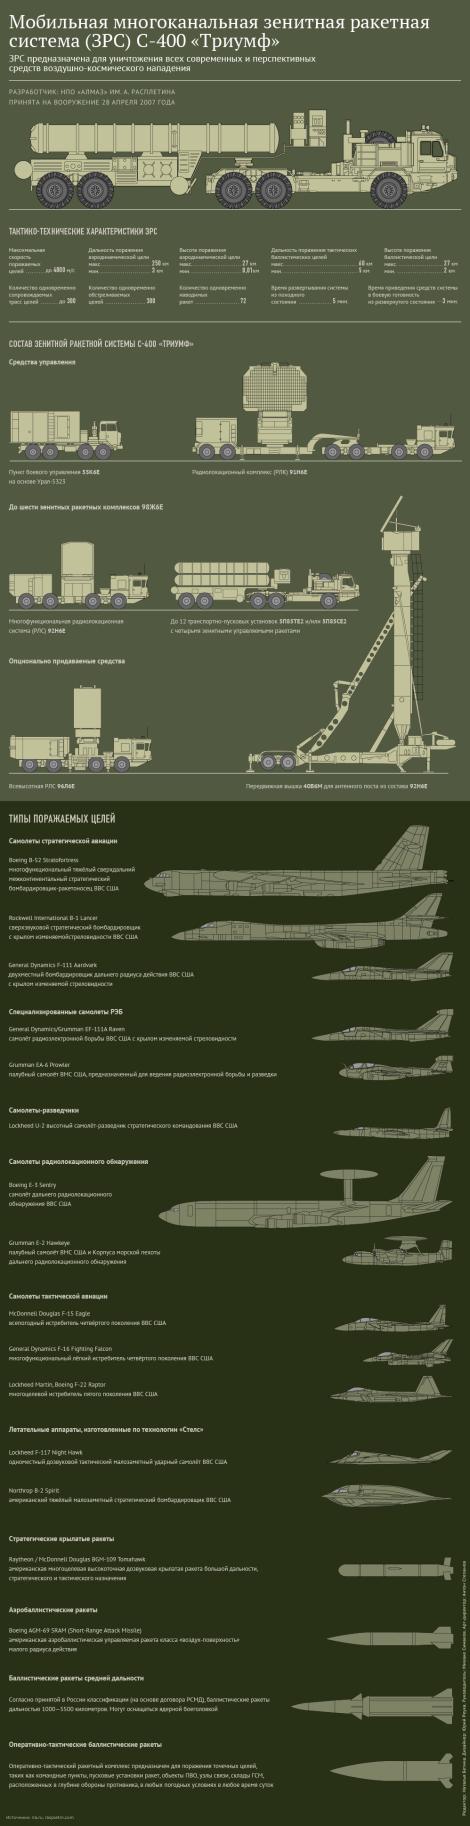 С-400 73